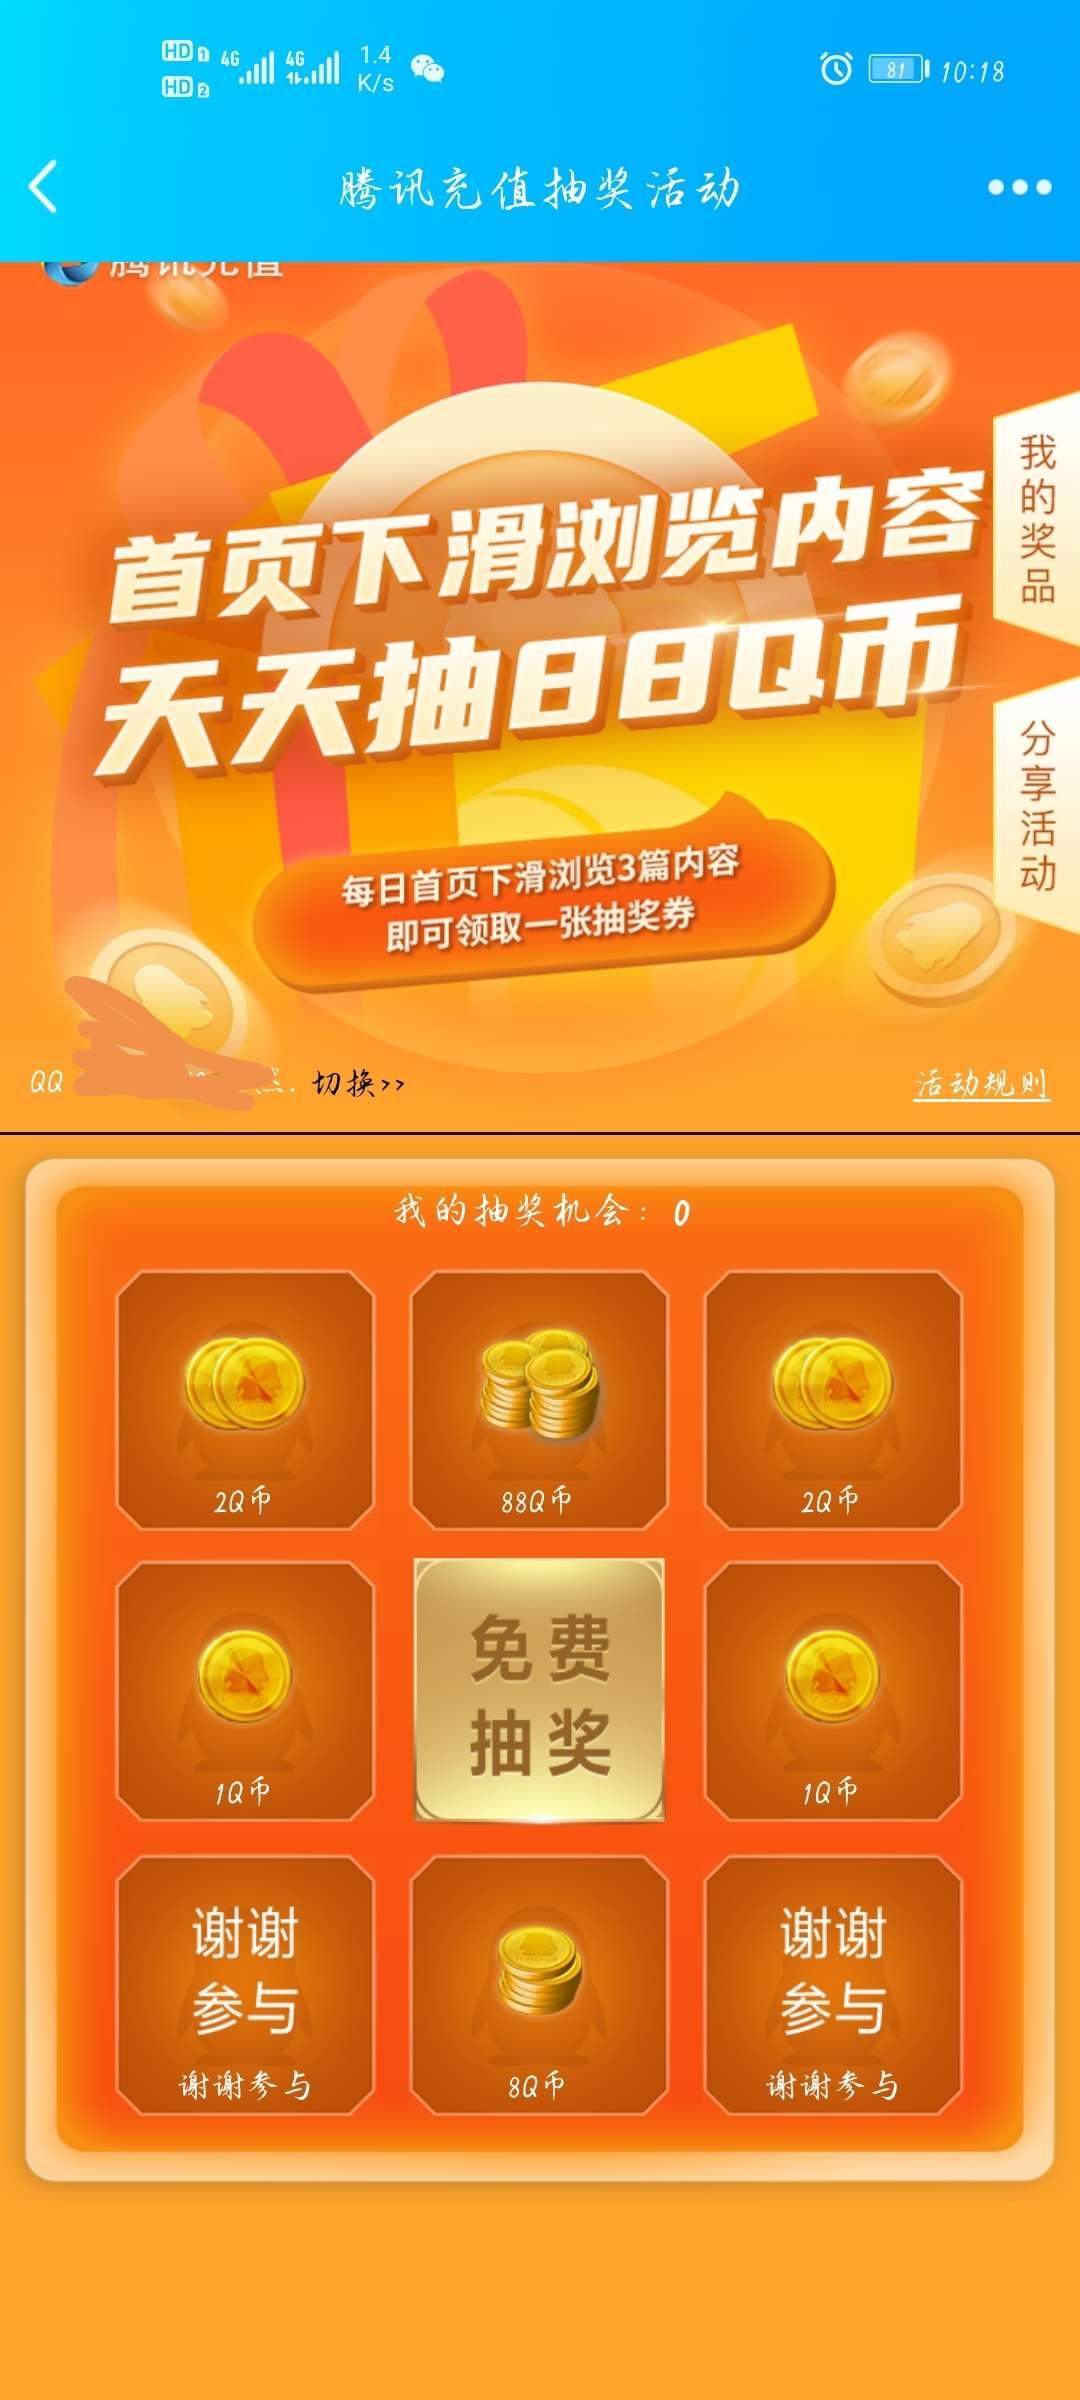 QQ钱包抽1~88QB【虚拟物品】插图2